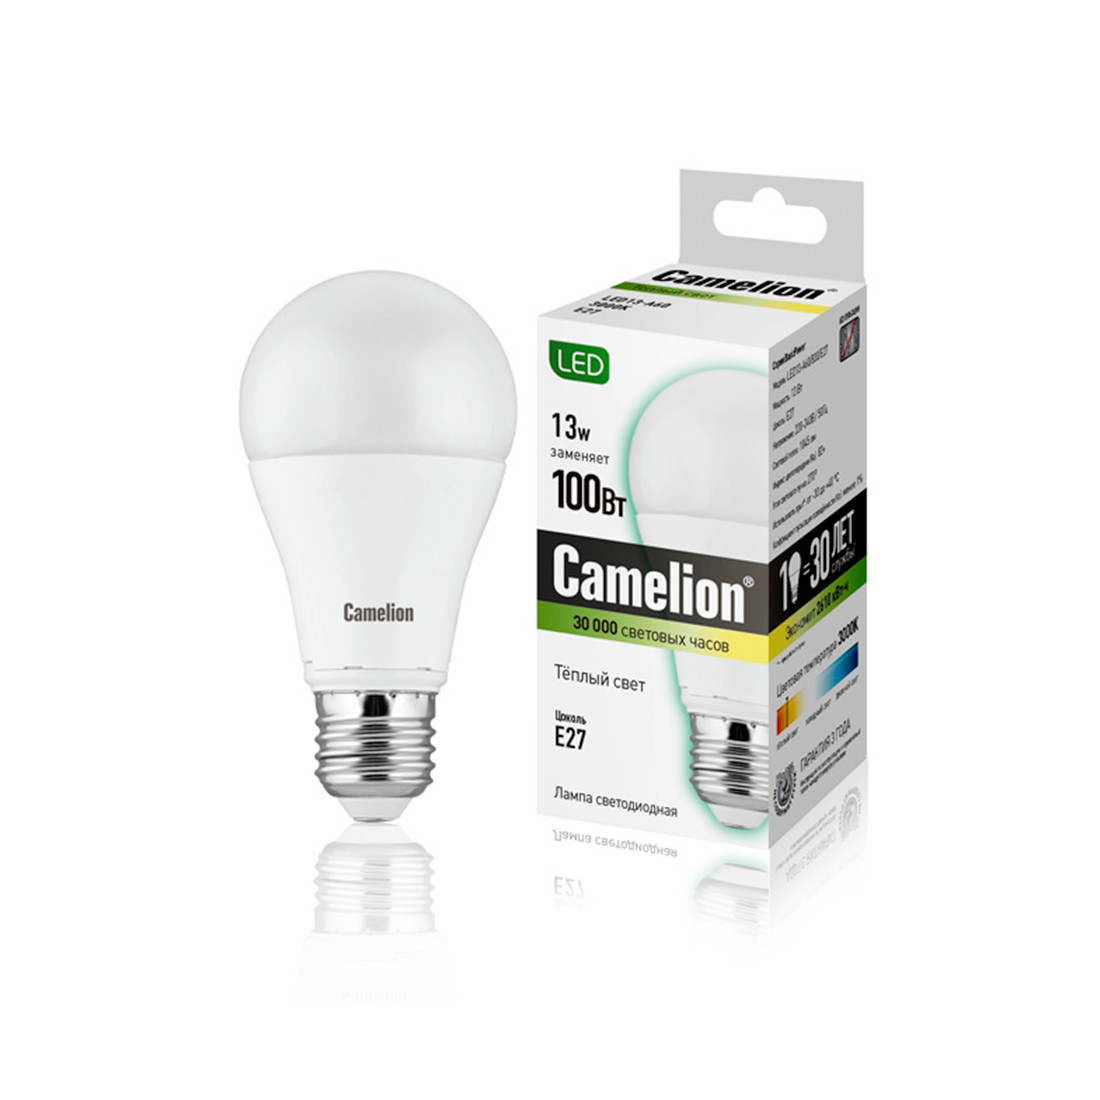 Эл. лампа светодиодная  Camelion  LED13-A60/830/E27